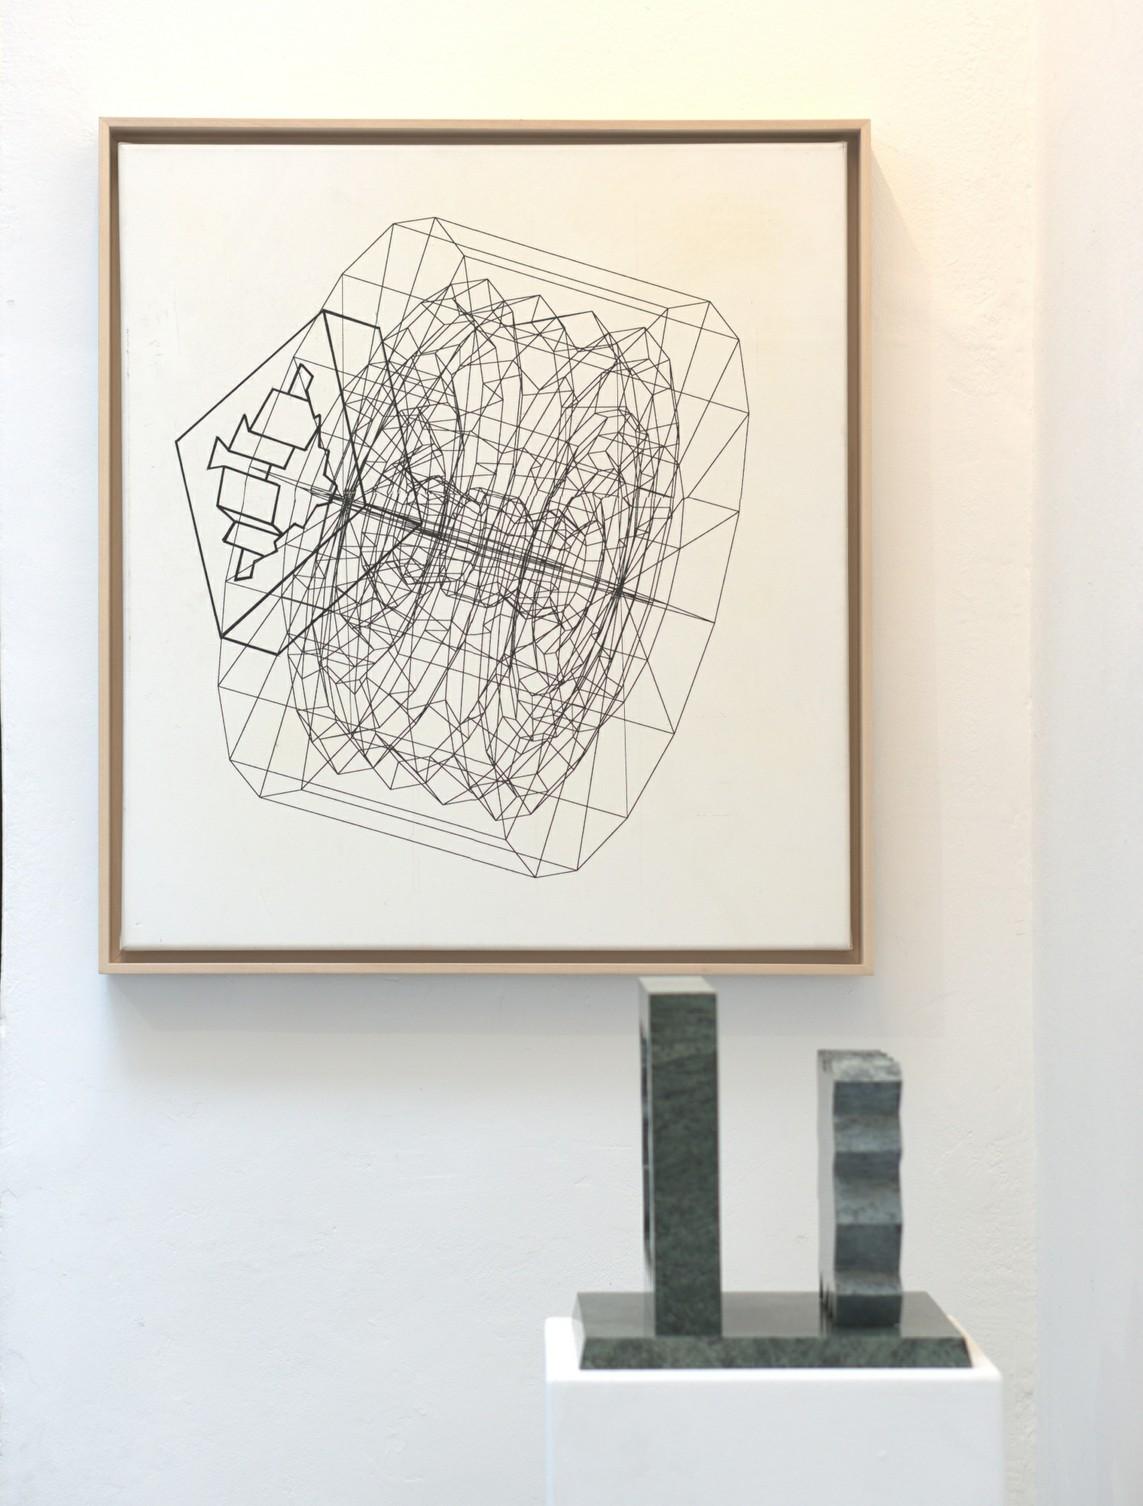 o.T., 2000, Tusche auf Leinwand, 70 x 63 cm